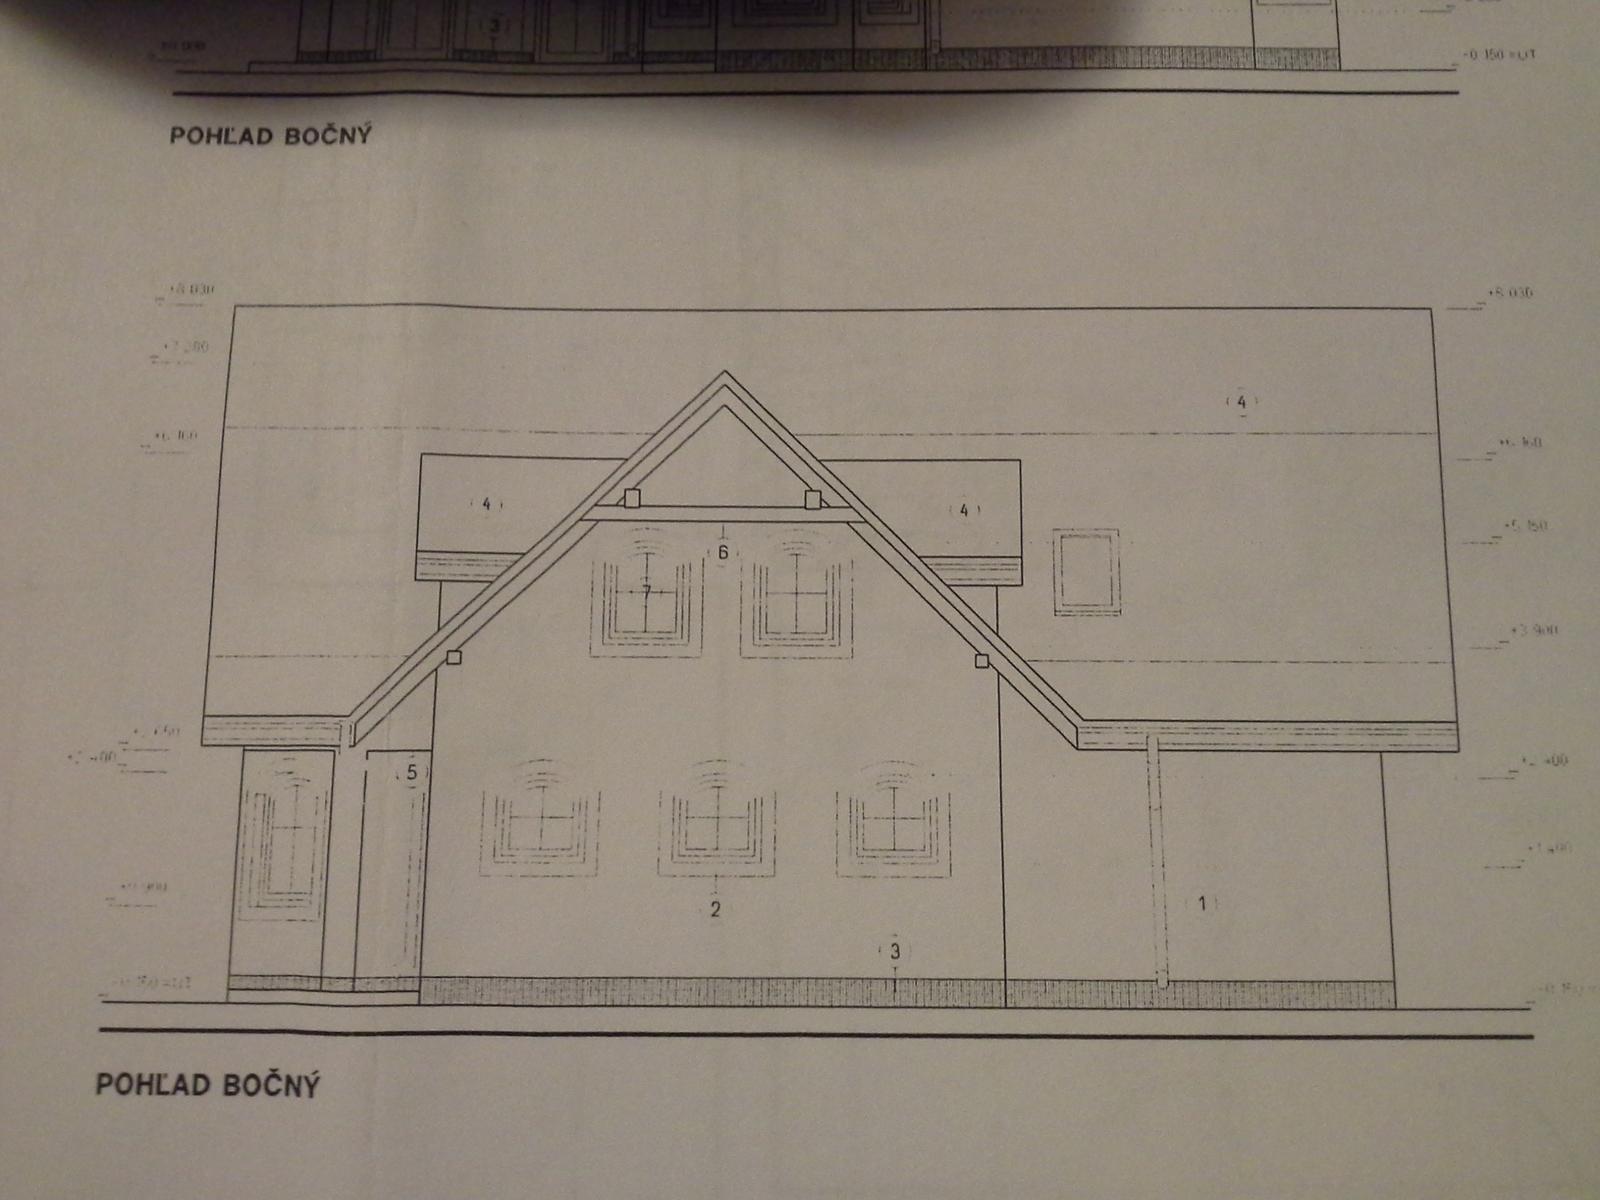 Nas zamocek - Klassik 148 prodom - male garazove okna budu nahradene vacsimi a bude to malinko sirsia izba..